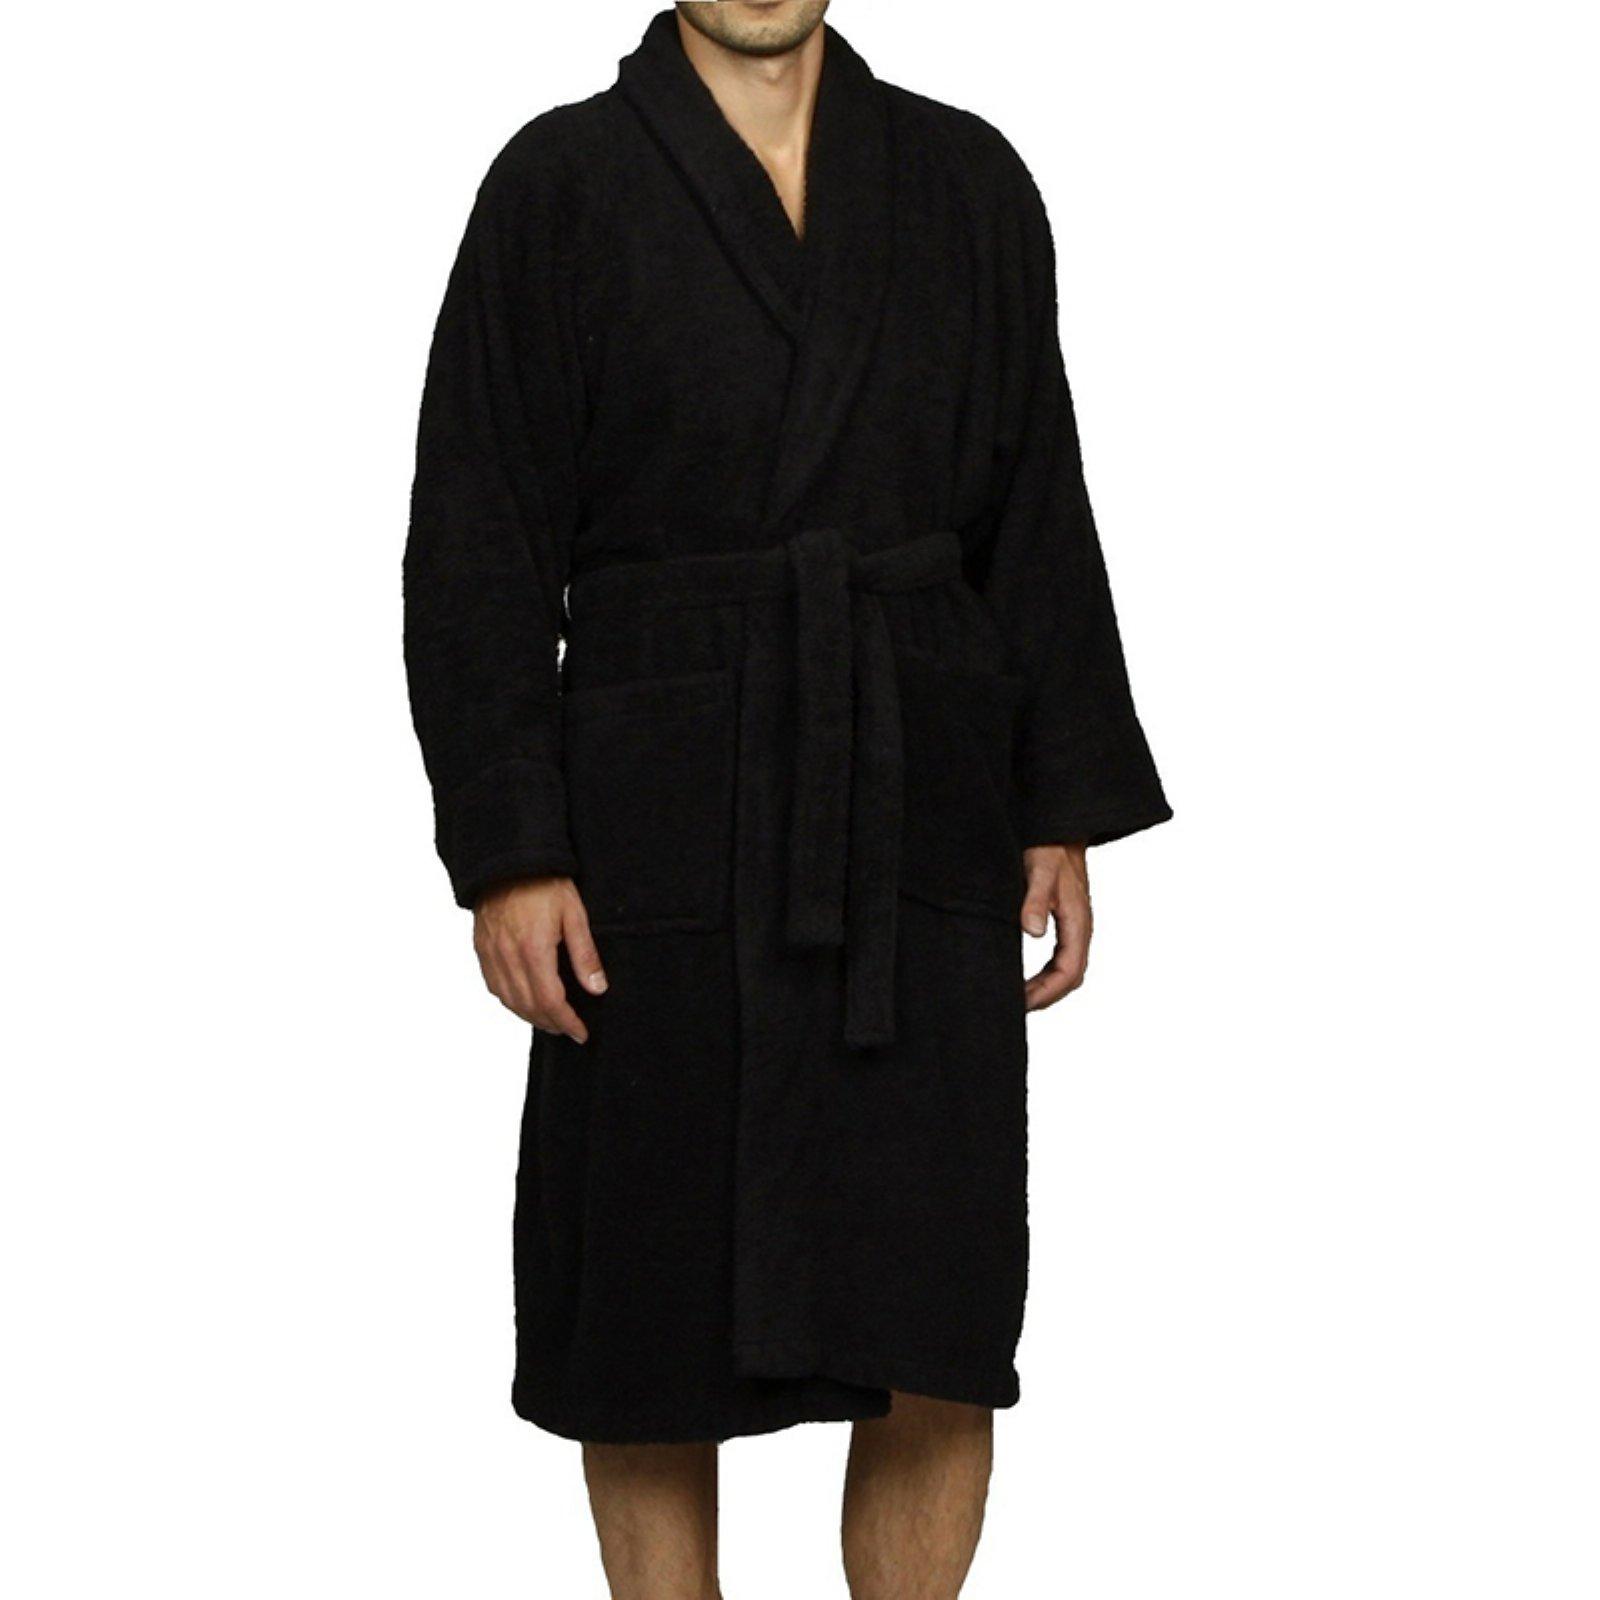 Simple Elegance Superior Collection Luxurious Egyptian Cotton Unisex Terry Bath Robe , Size: L , Size L 12 - 14, Black - L (12 - 14)